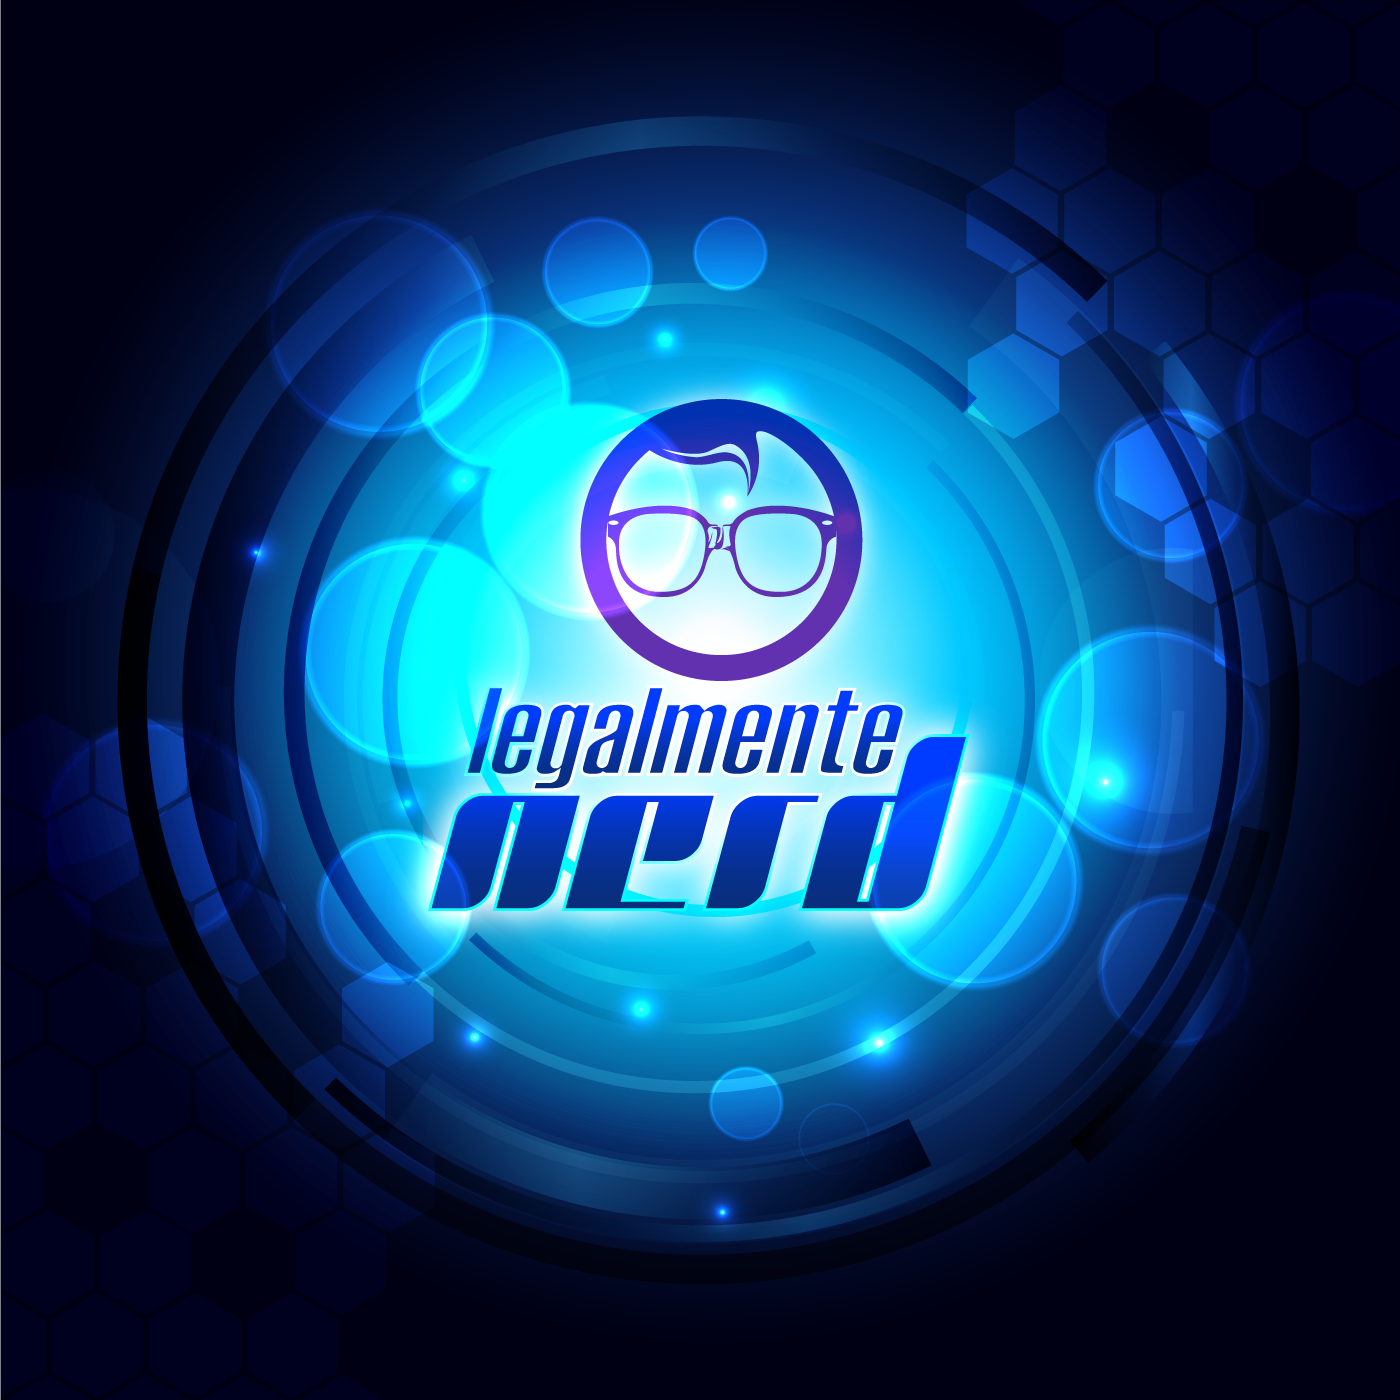 Artwork for Legalmente Nerd: Fantastic GamesCon